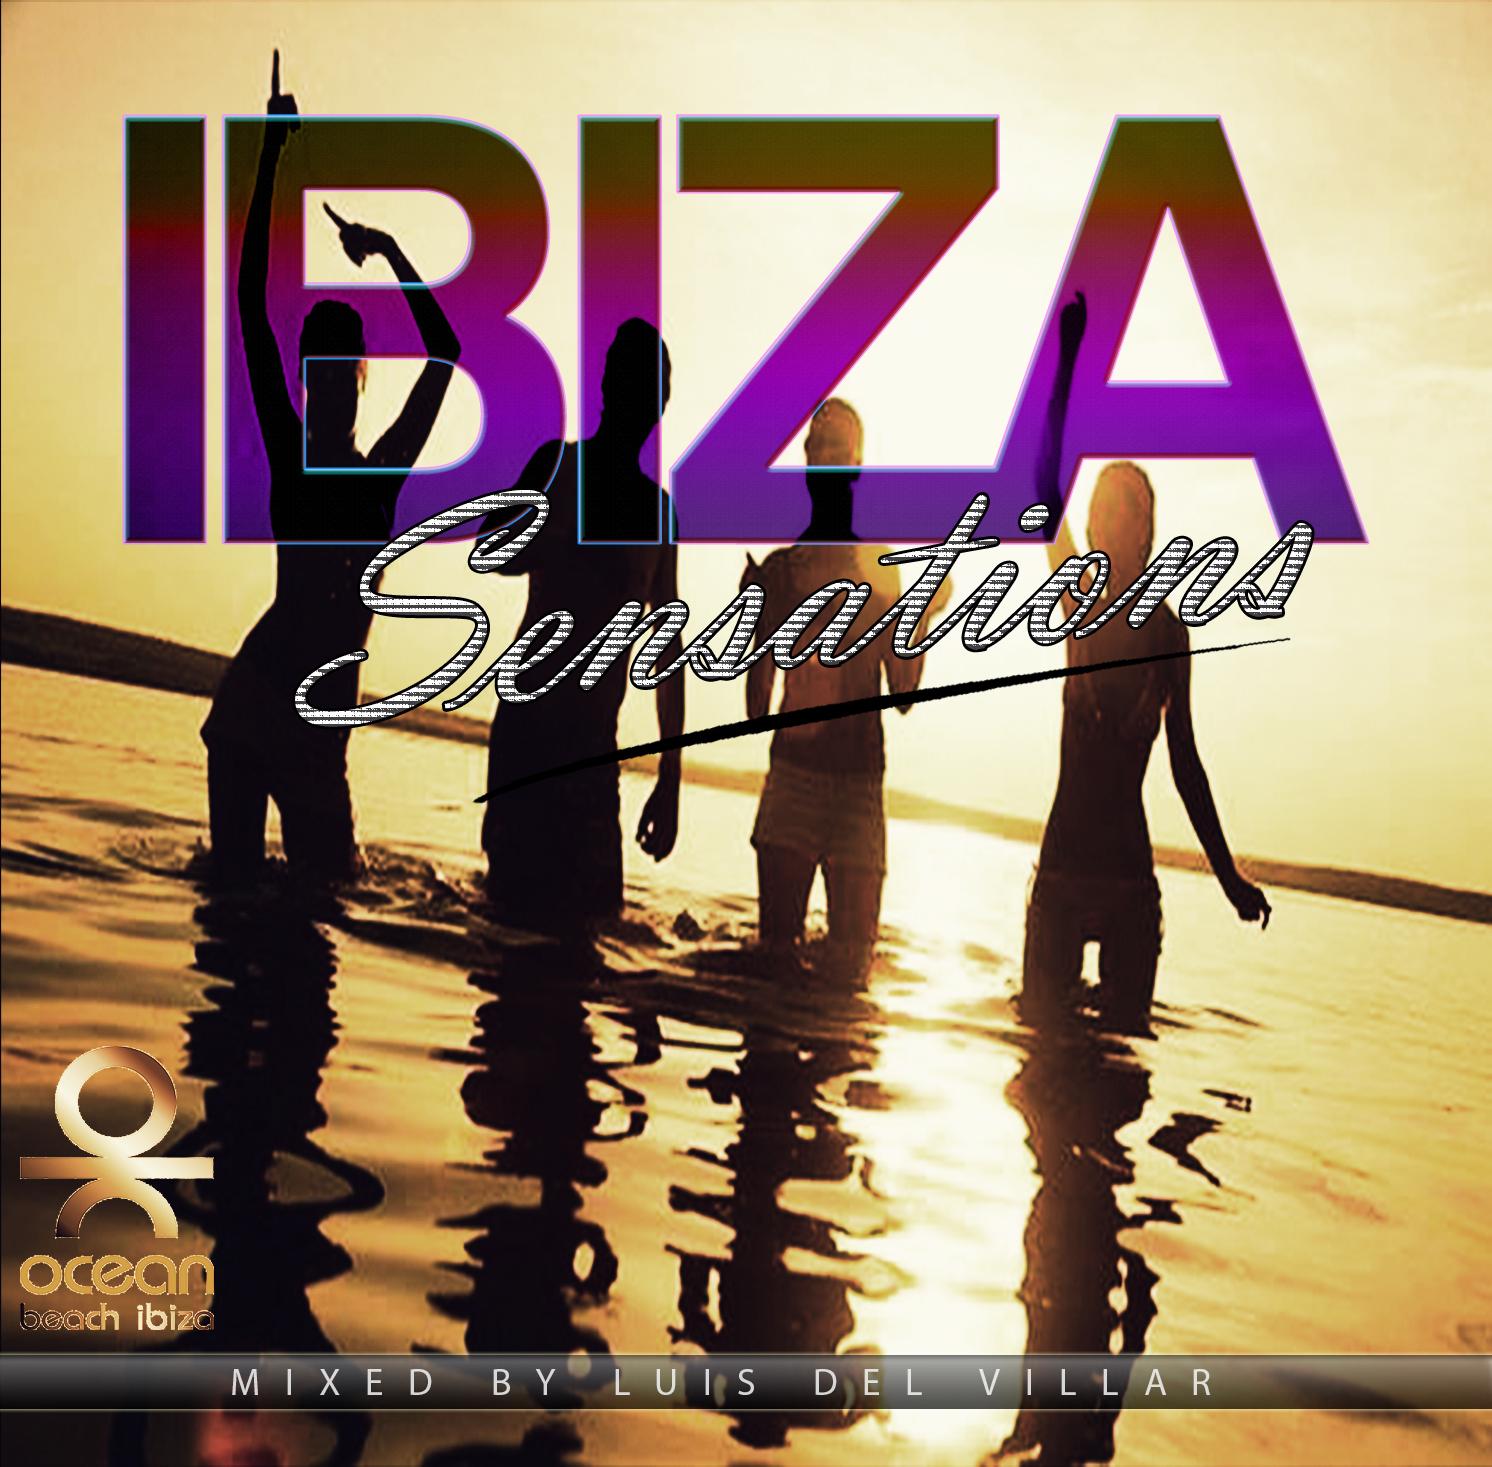 Artwork for Ibiza Sensations 71